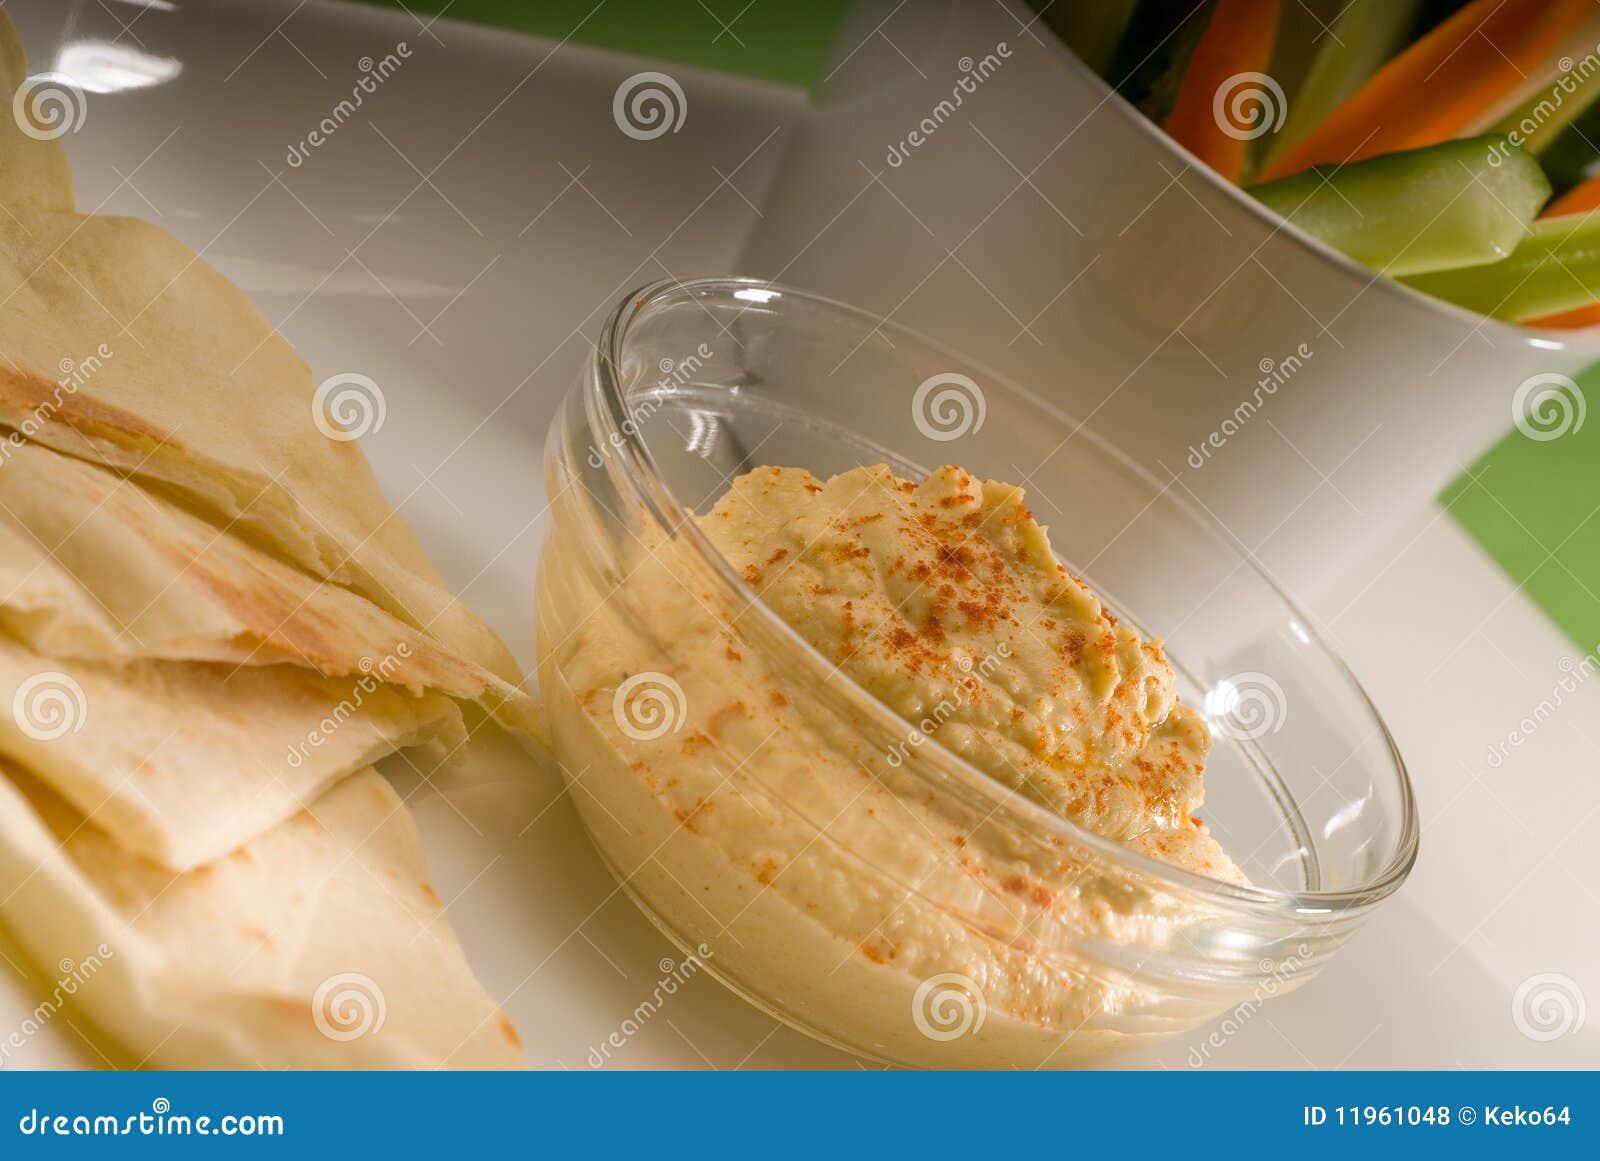 Hummus Stuffed Pita With Roasted Vegetables Recipes — Dishmaps